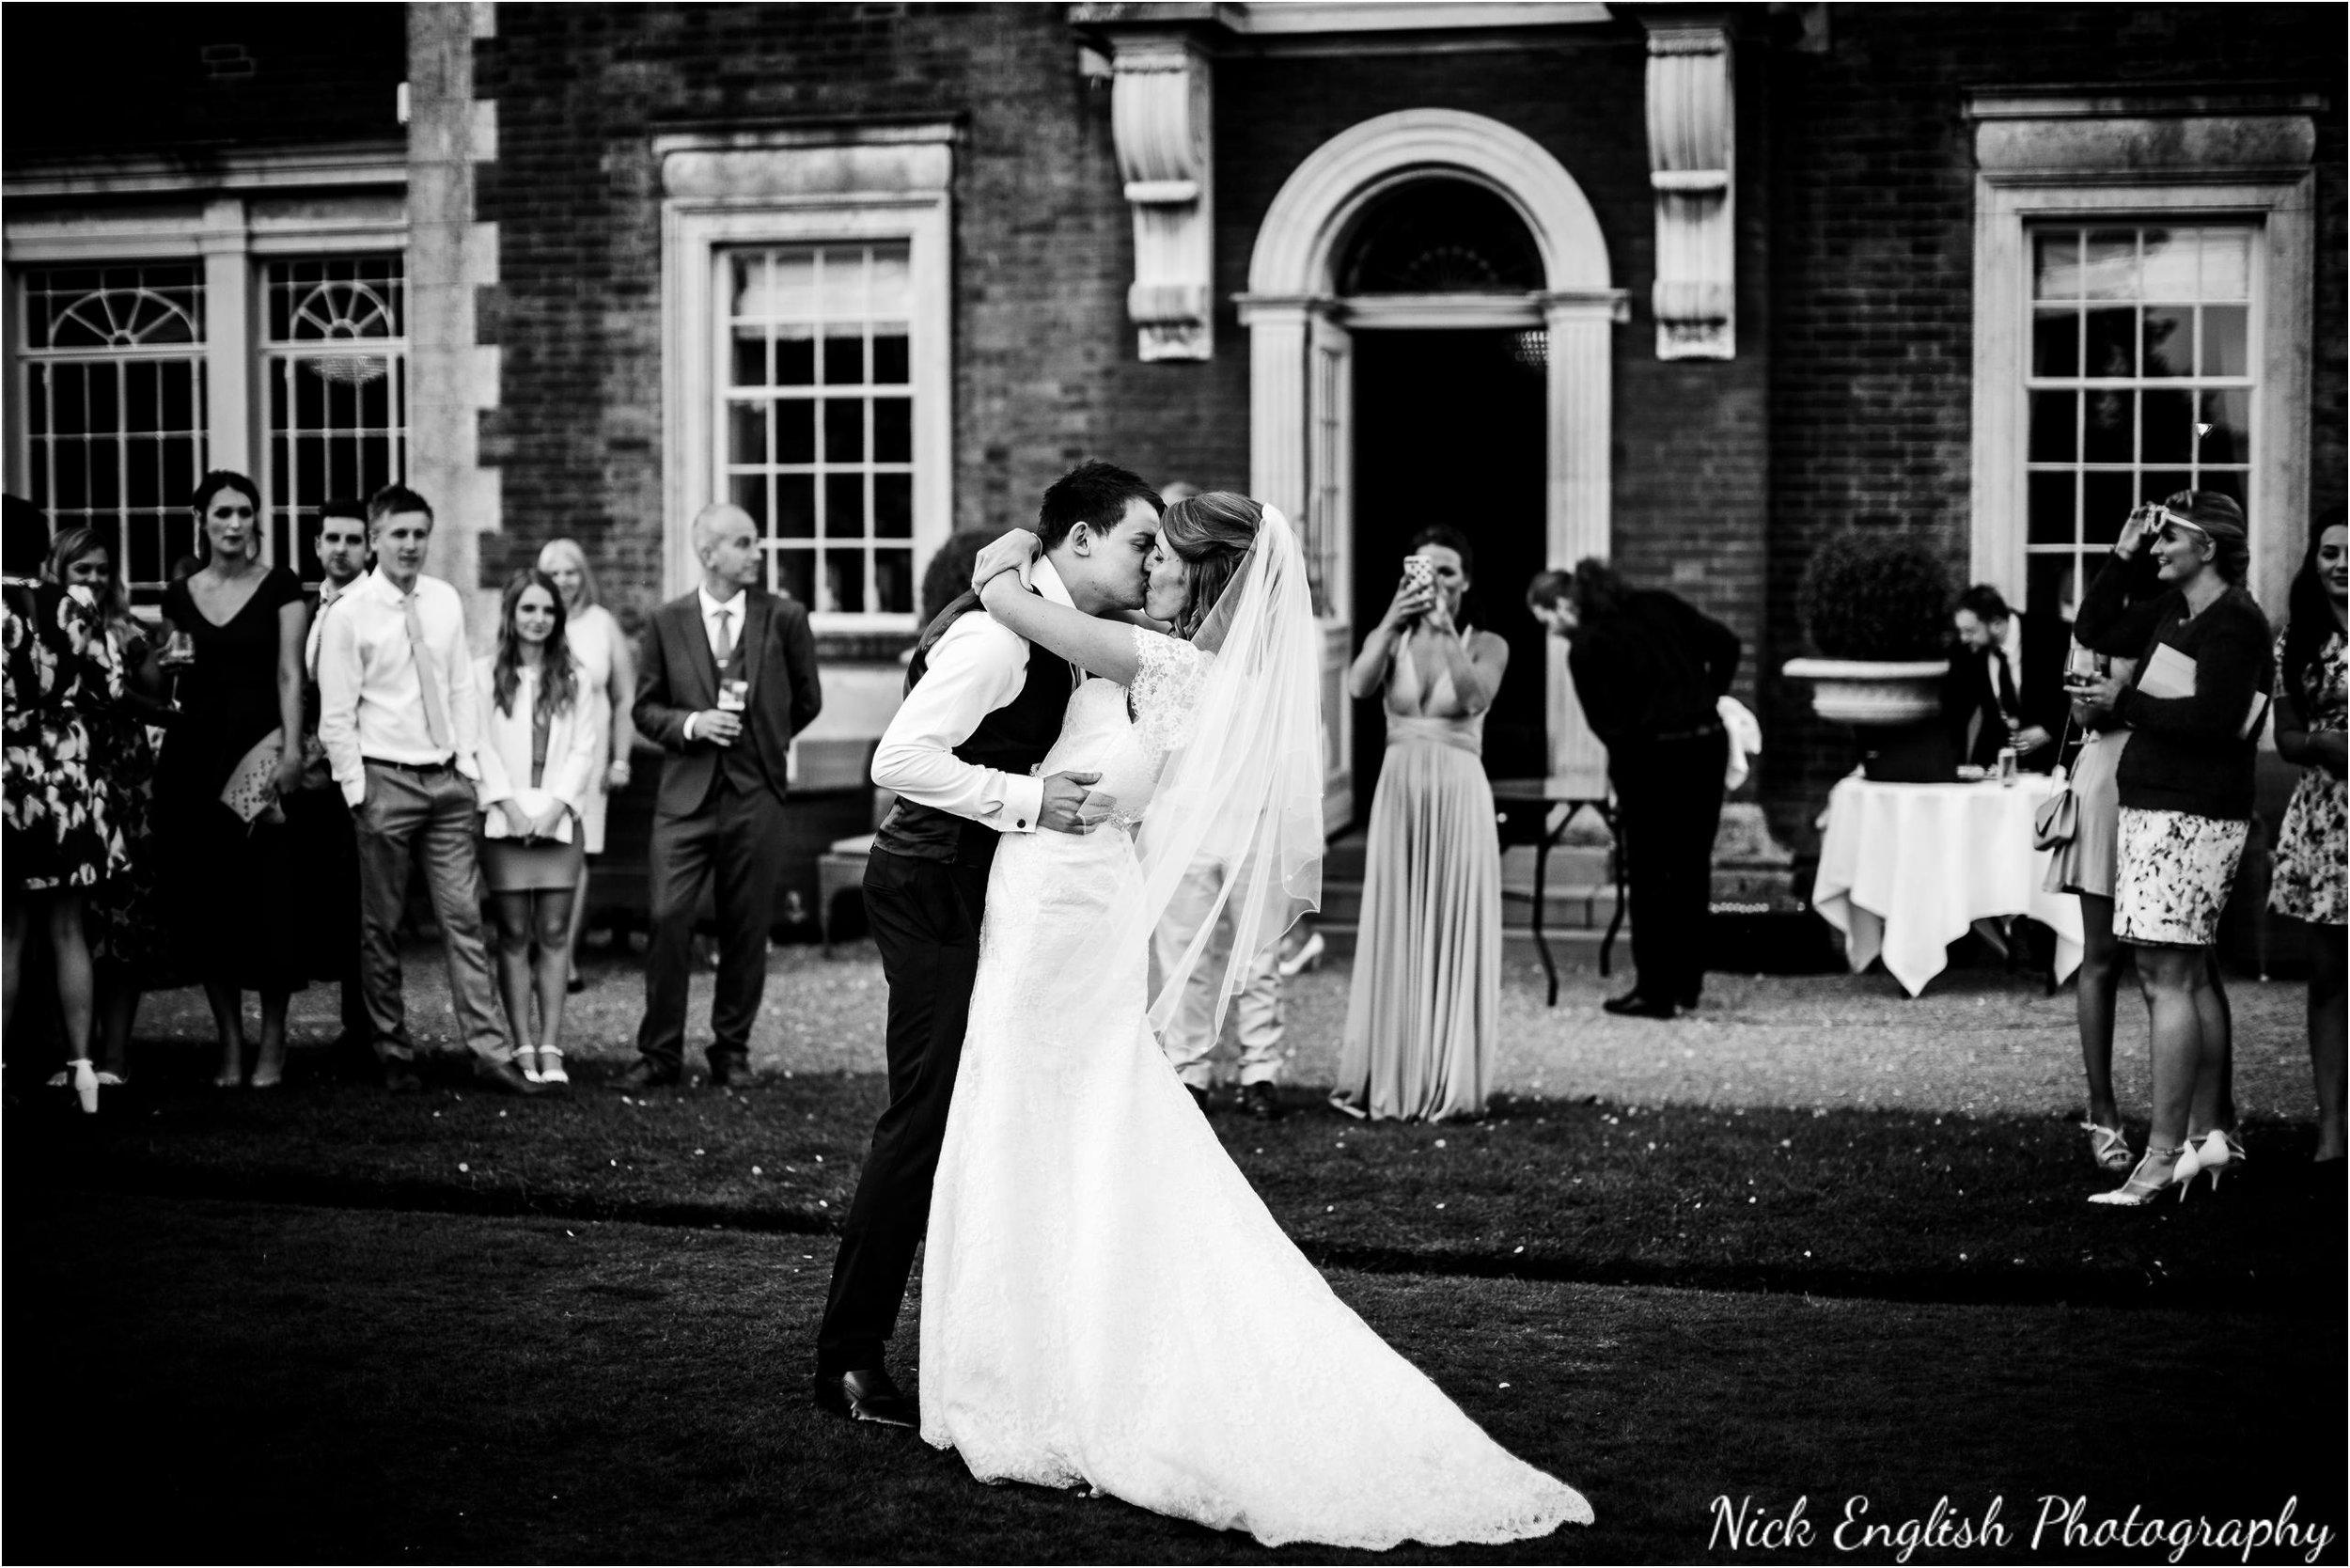 Alison James Wedding Photographs at Eaves Hall West Bradford 238jpg.jpeg